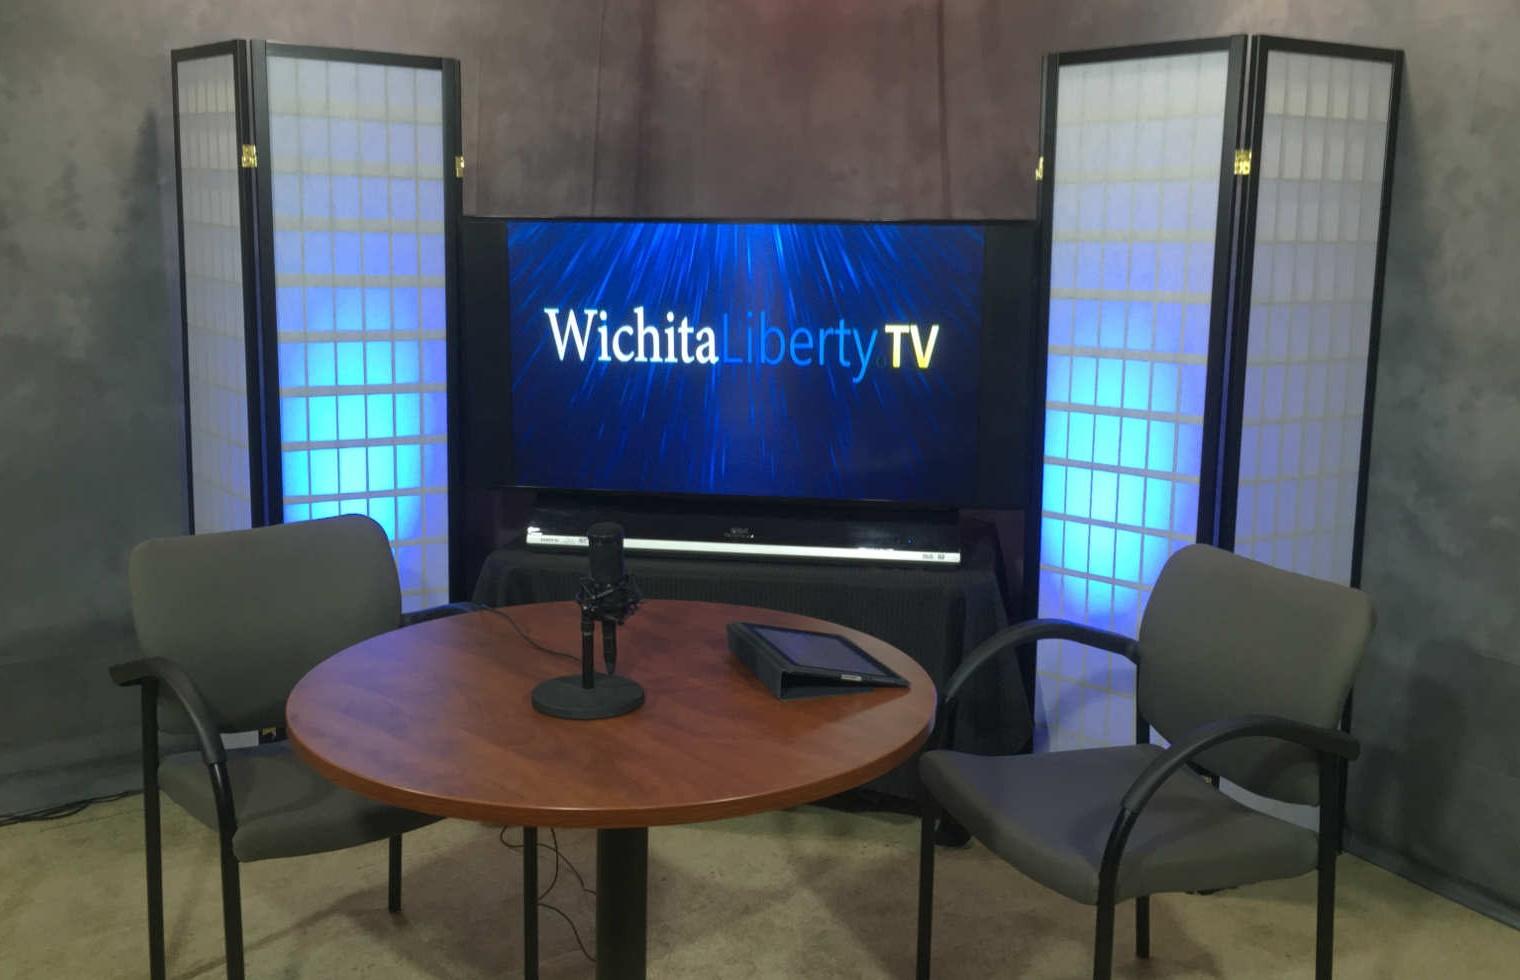 WichitaLiberty.TV: Markets or government, legislative malpractice, and education reform